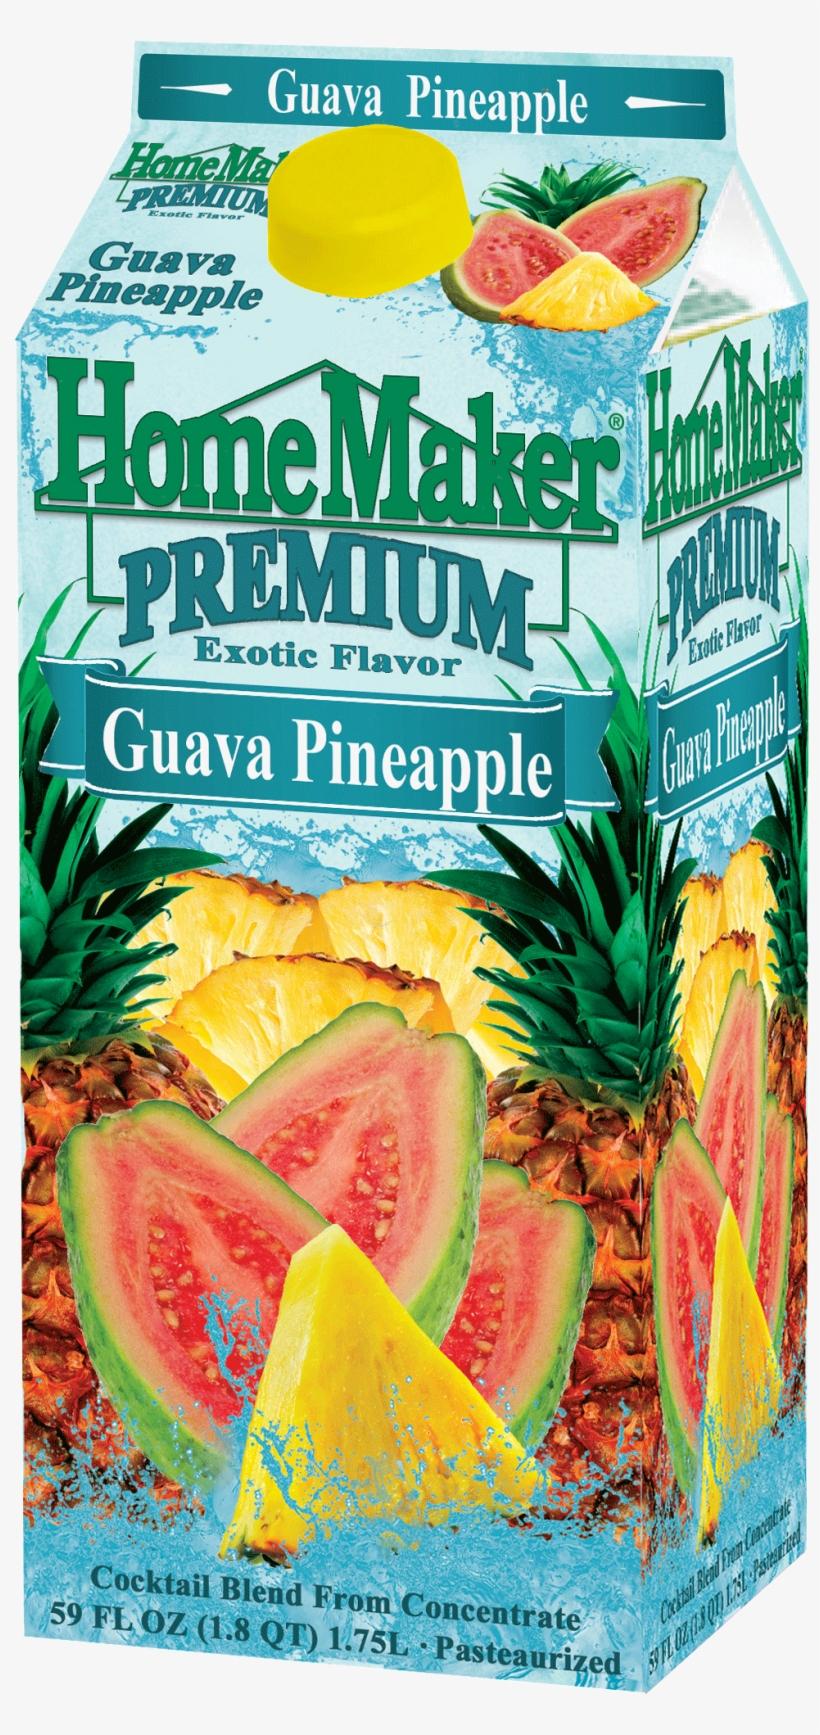 Passion Fruit And Guava Pineapple - Homemaker Orange Juice, 100% Florida, Original - 59, transparent png #609126